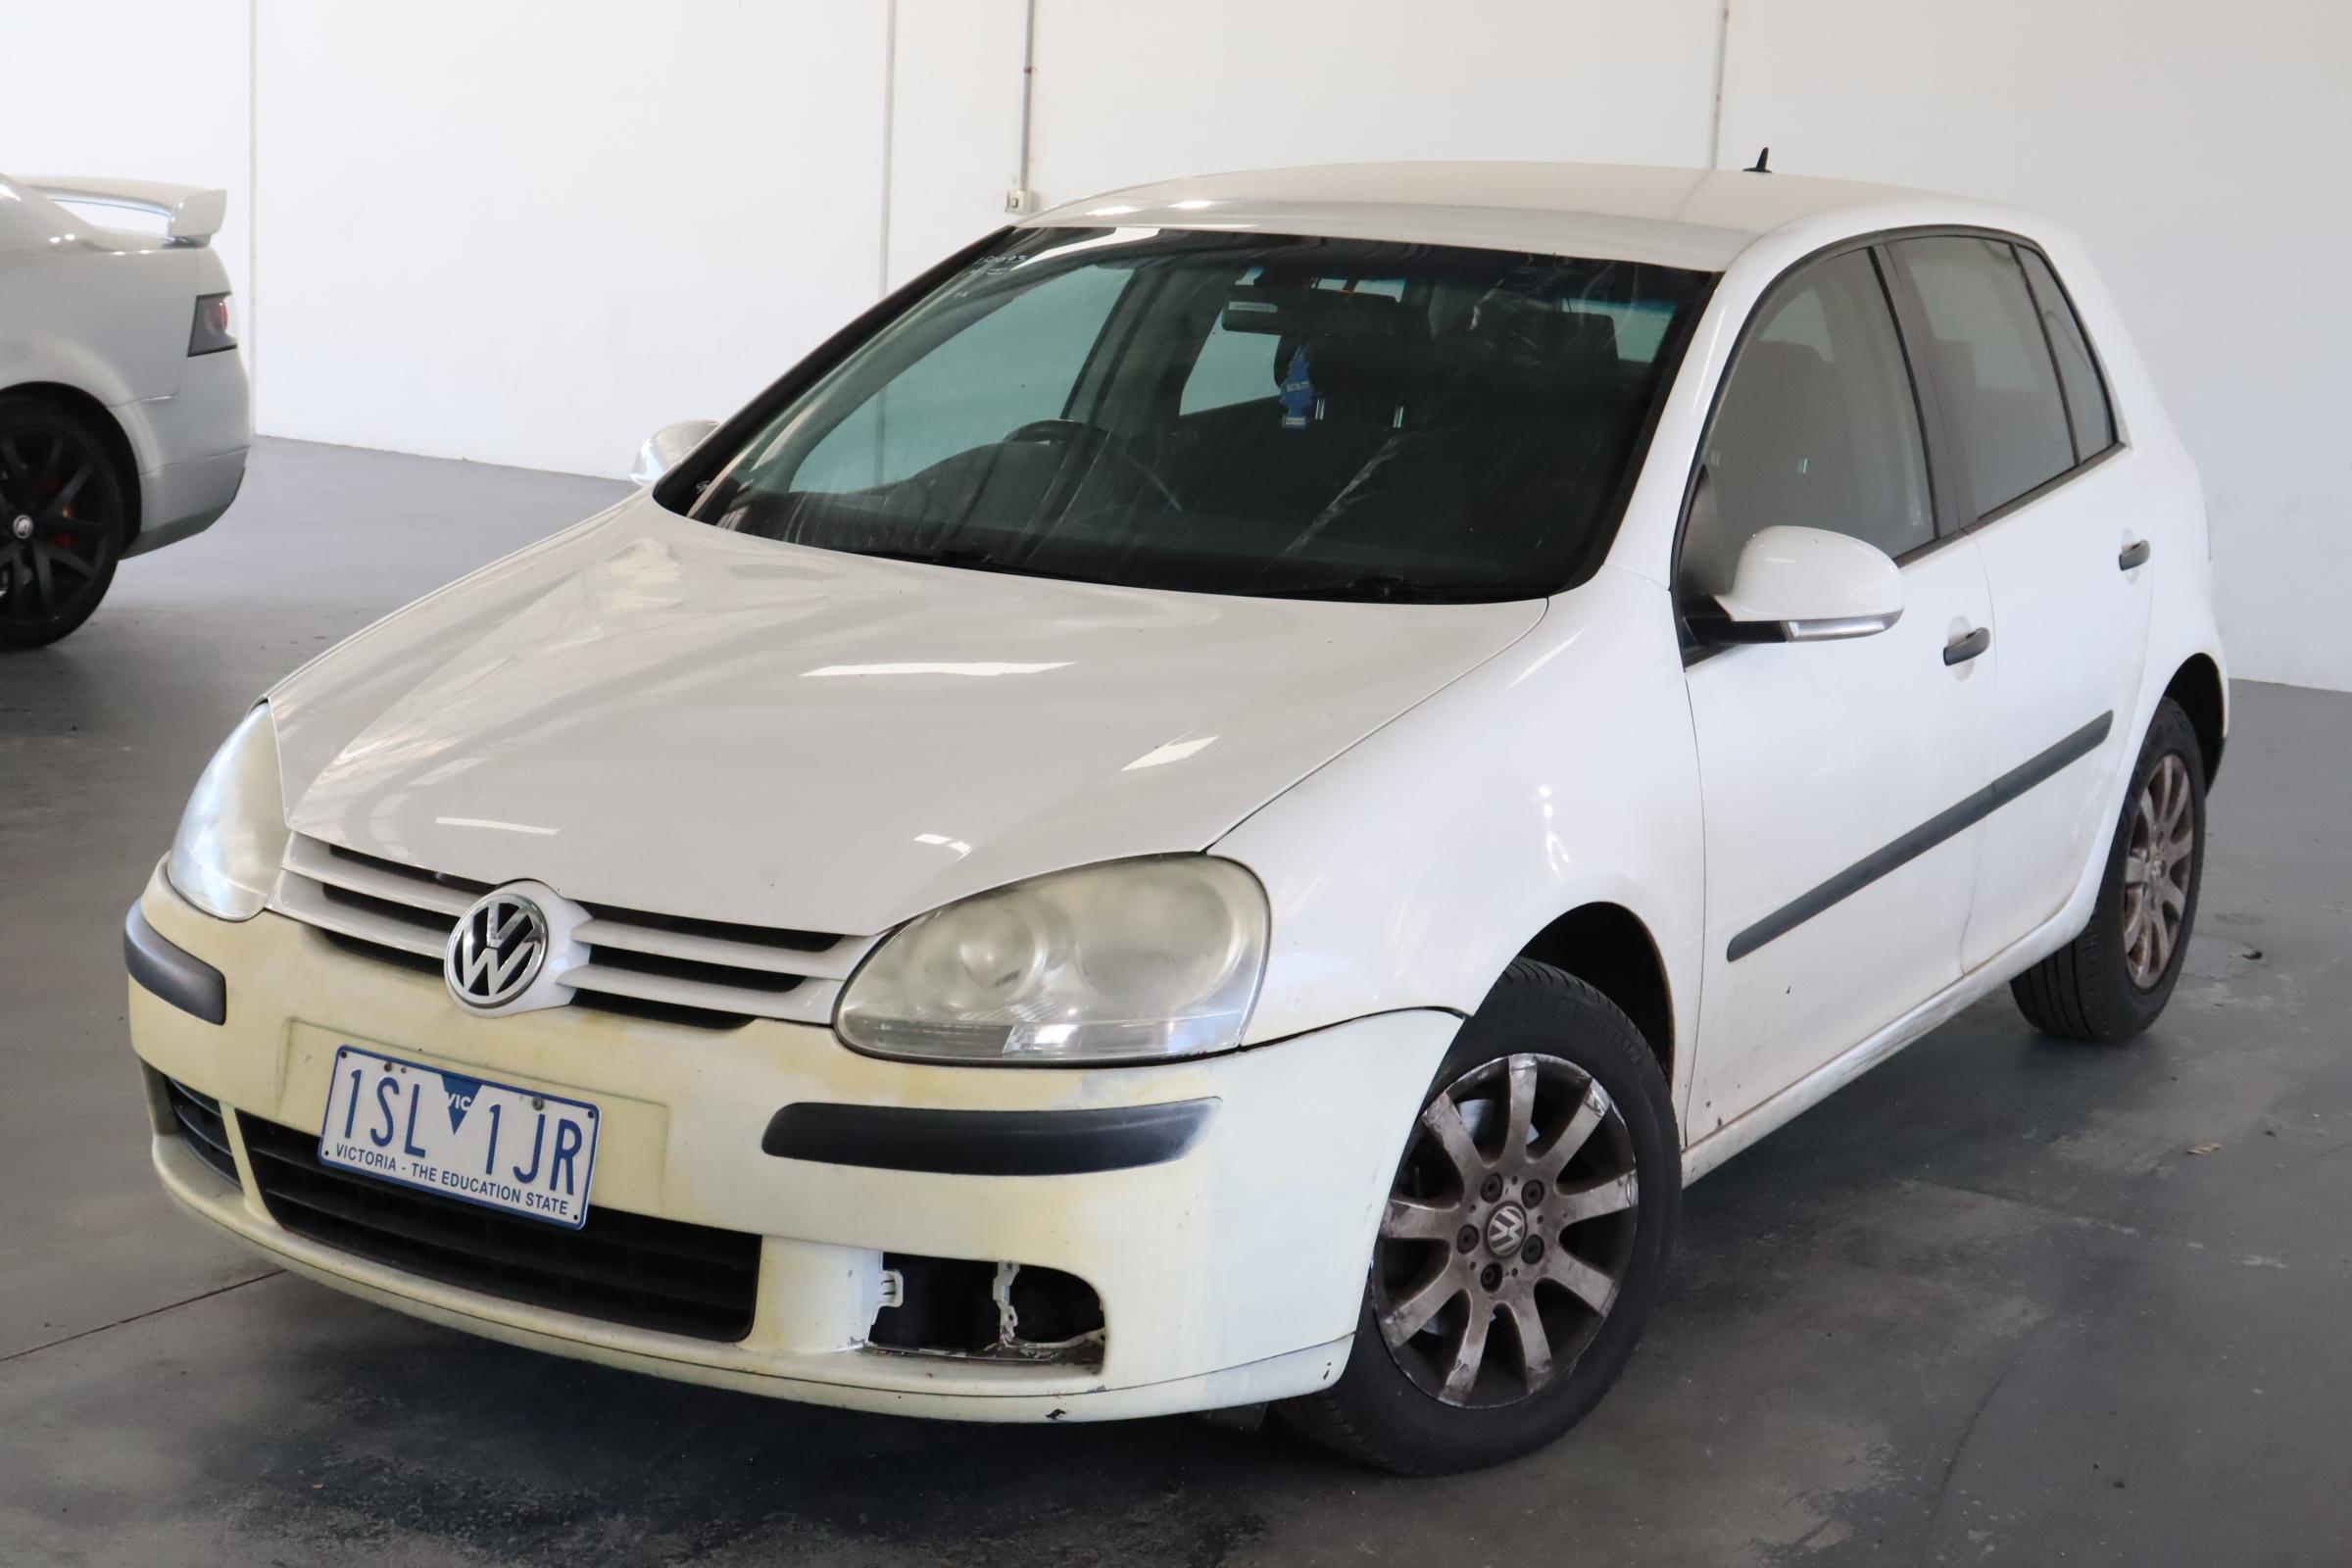 2006 Volkswagen Golf 2.0 TDI Comfortline 1k T/Diesel Automatic Hatchback